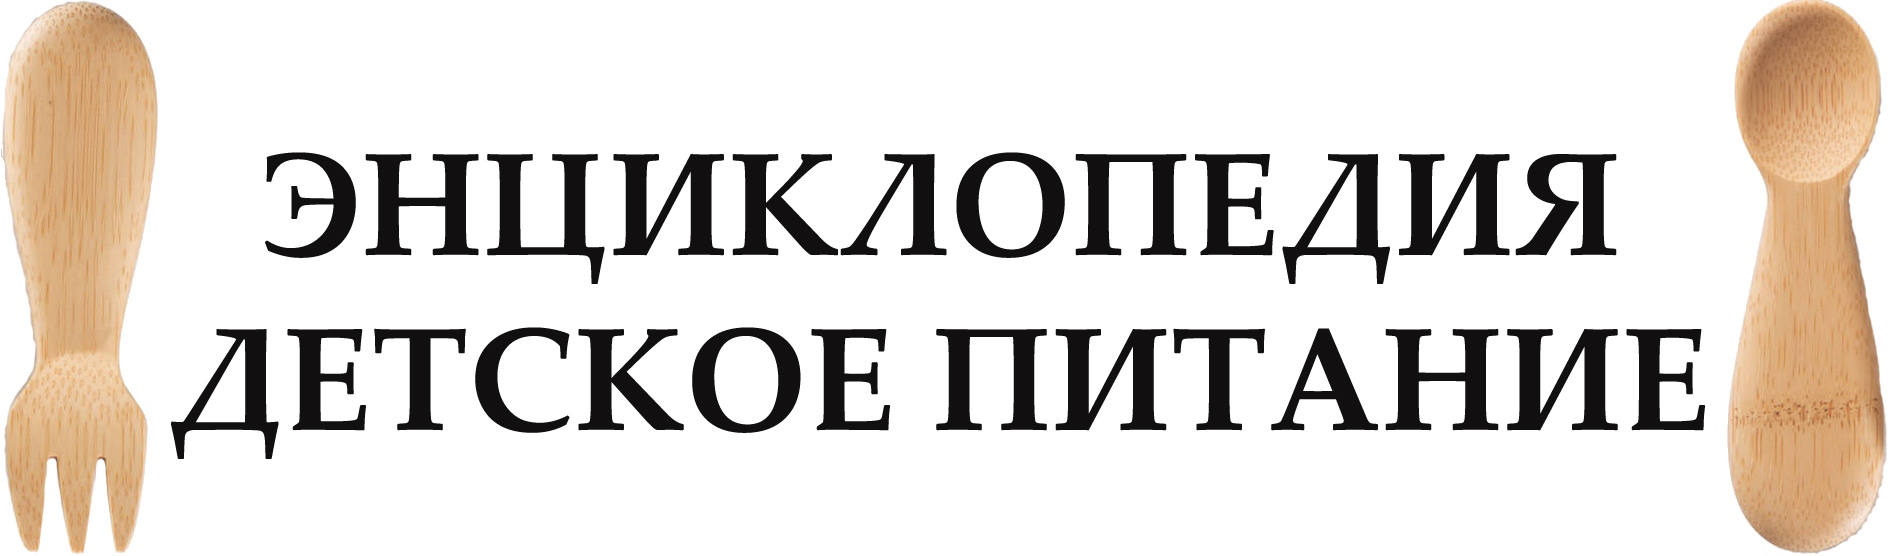 pitanie detskoe - Энциклопедия Детское питание